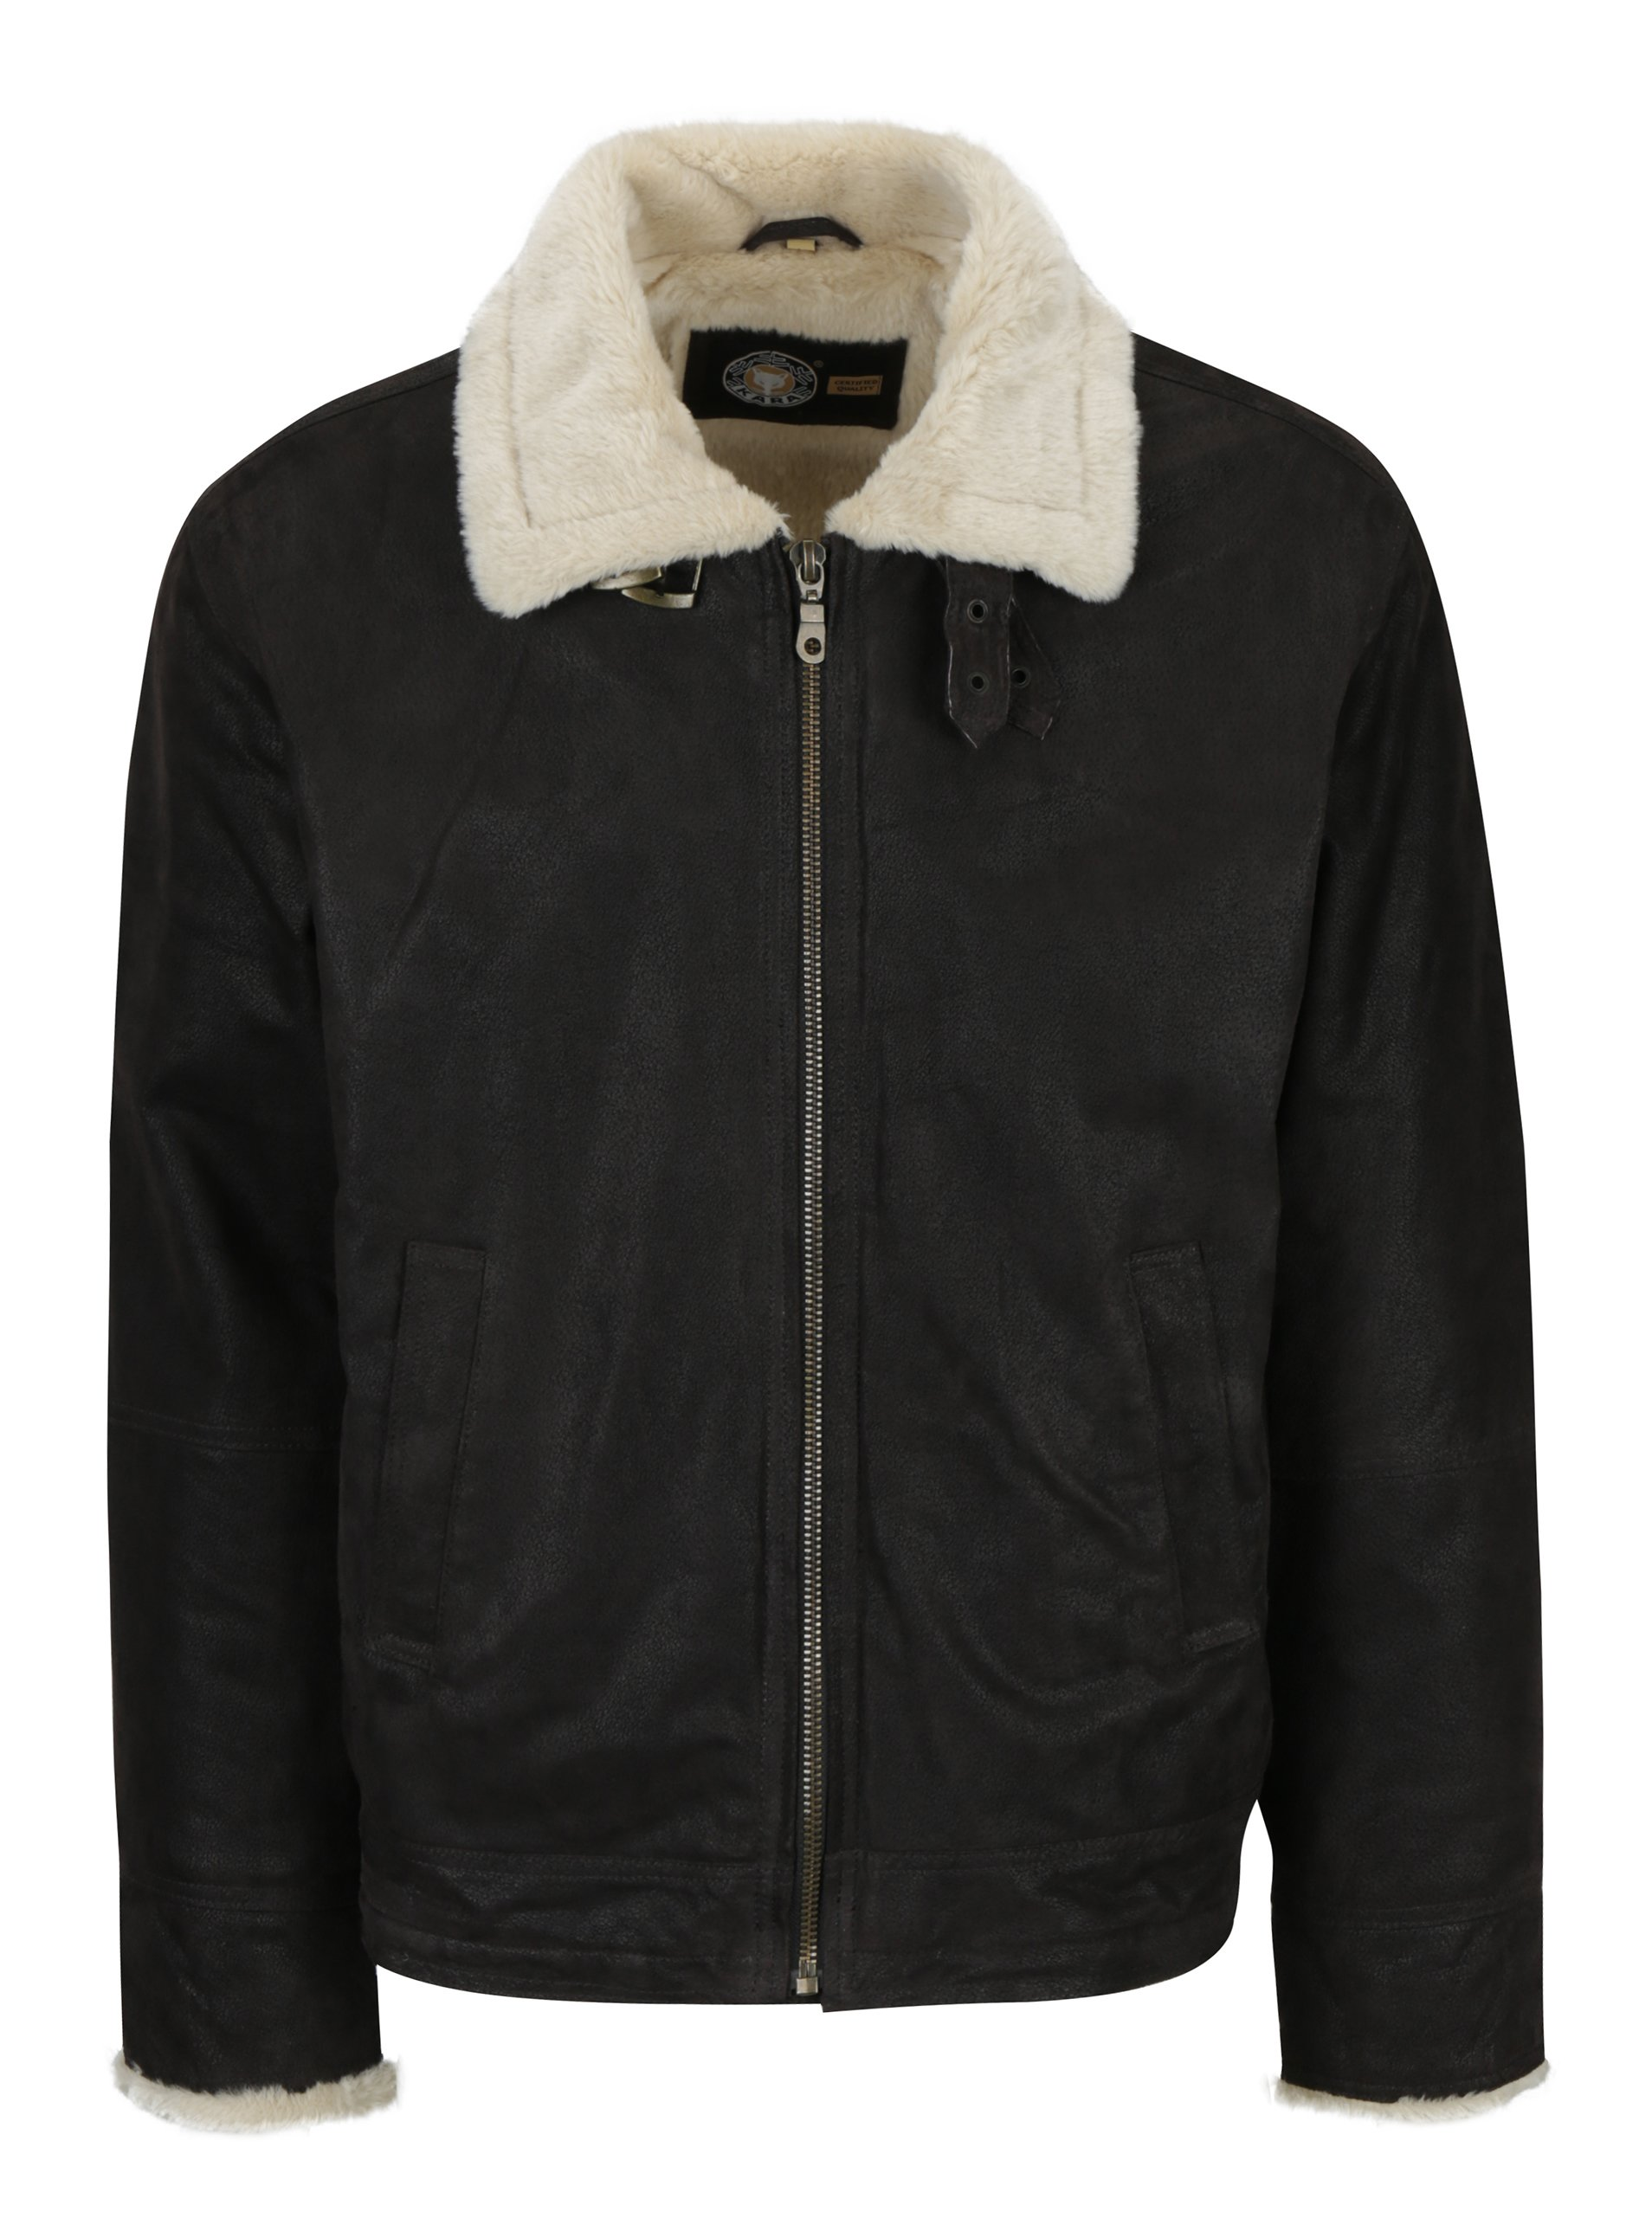 Hnědá pánská kožená bunda s umělou kožešinou KARA